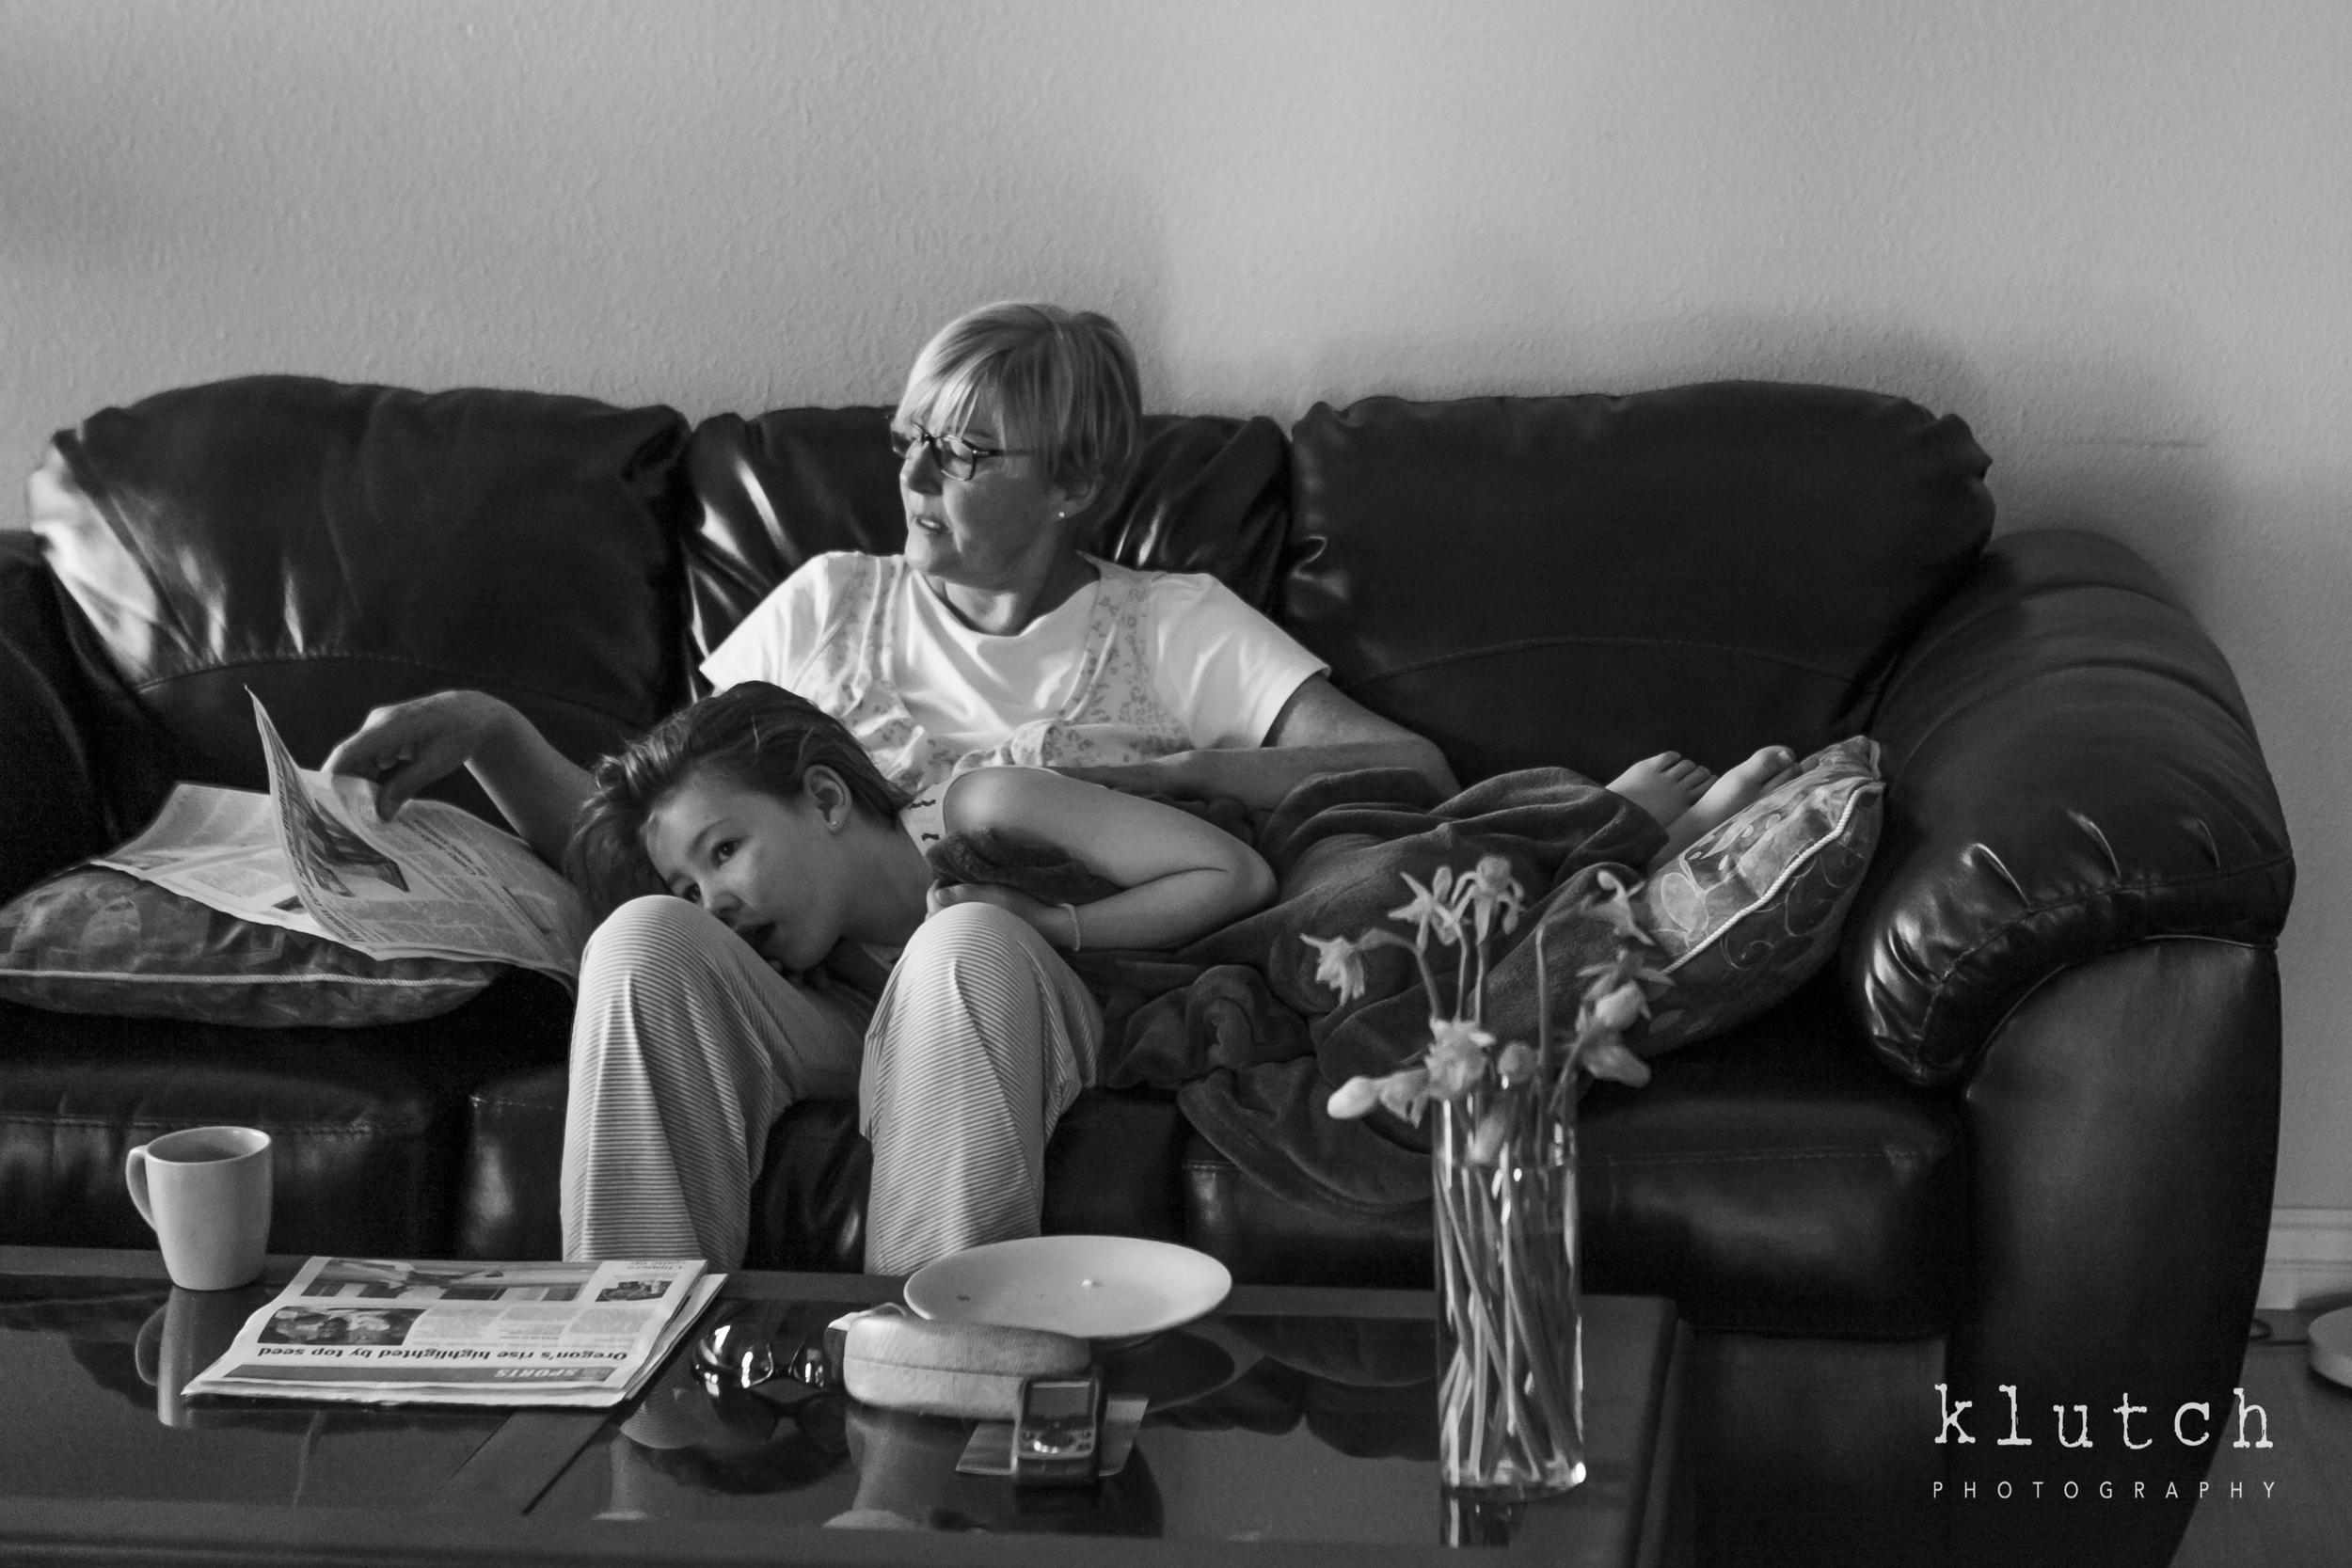 Klutch Photography,white rock family photographer, vancouver family photographer, whiterock lifestyle photographer, life unscripted photographer, life unscripted session, photography,Dina Ferreira Stoddard-20.jpg